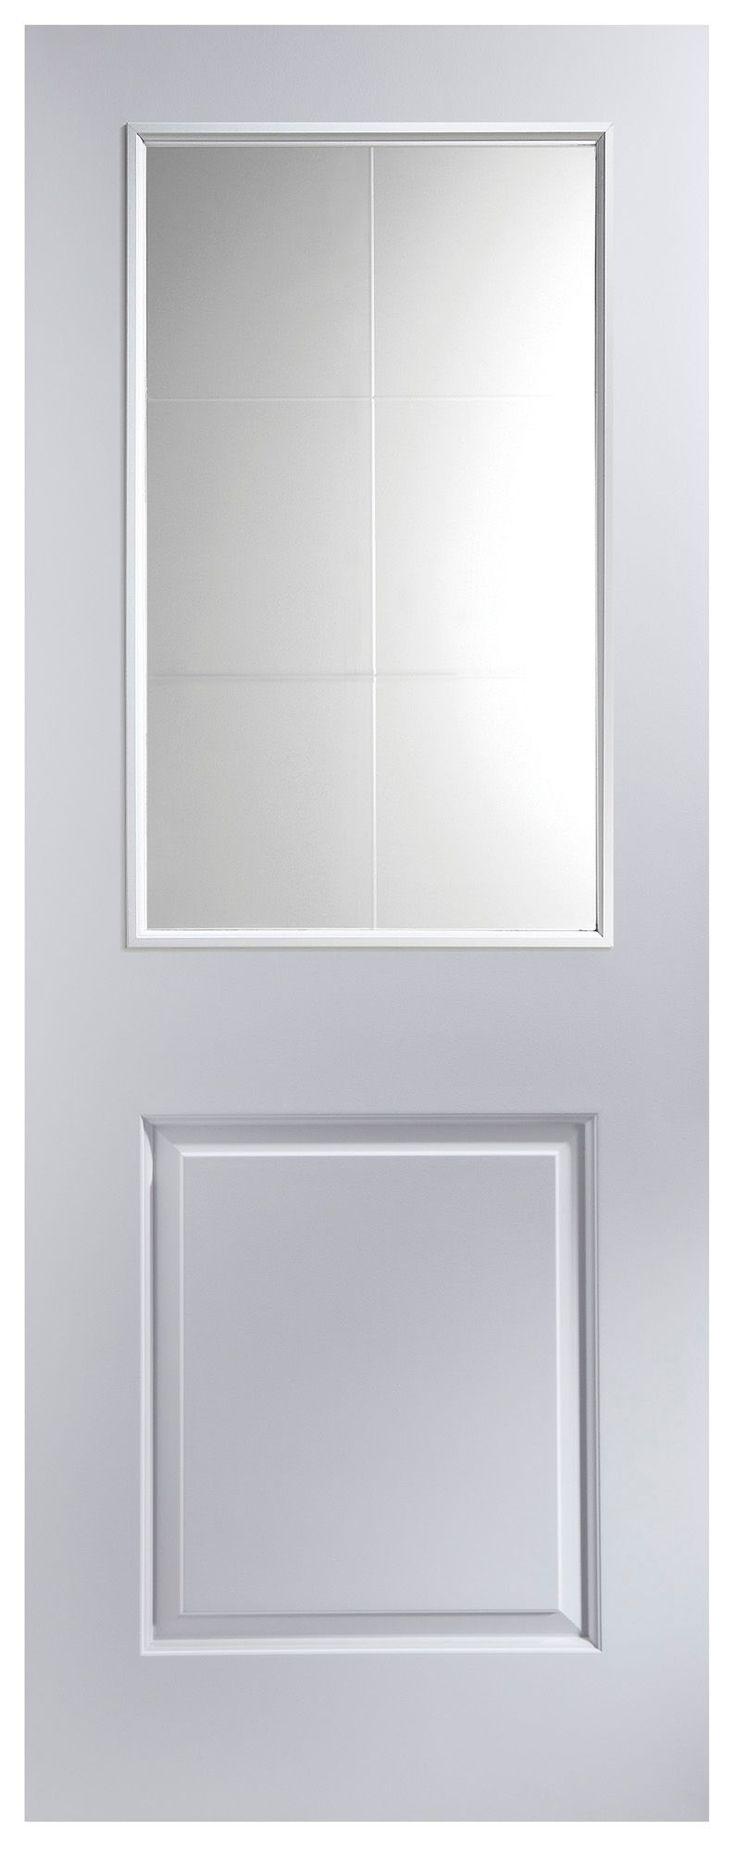 2 Panel Primed Smooth Glazed Internal Door, (H)1981mm (W)762mm